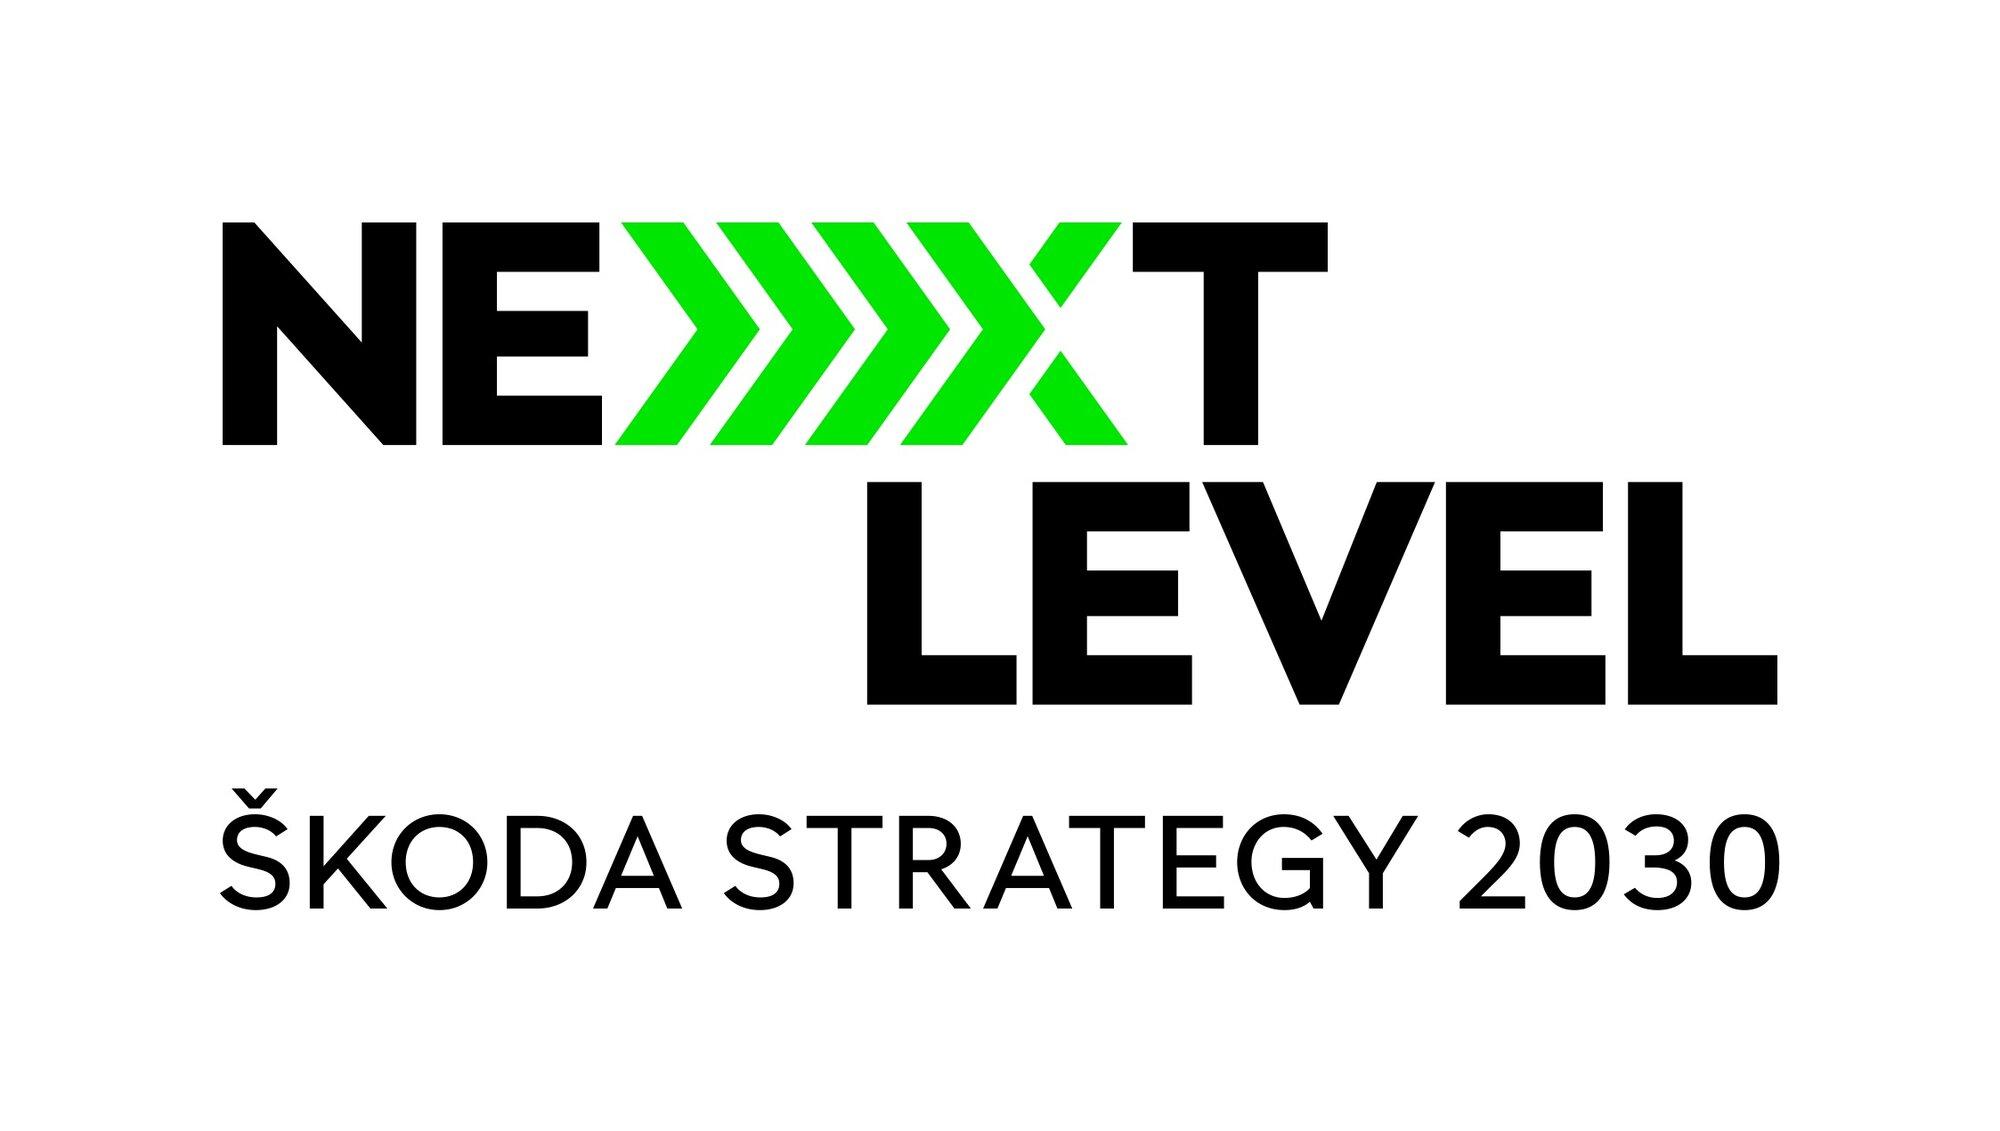 210617-skoda-strategy-2030.jpg